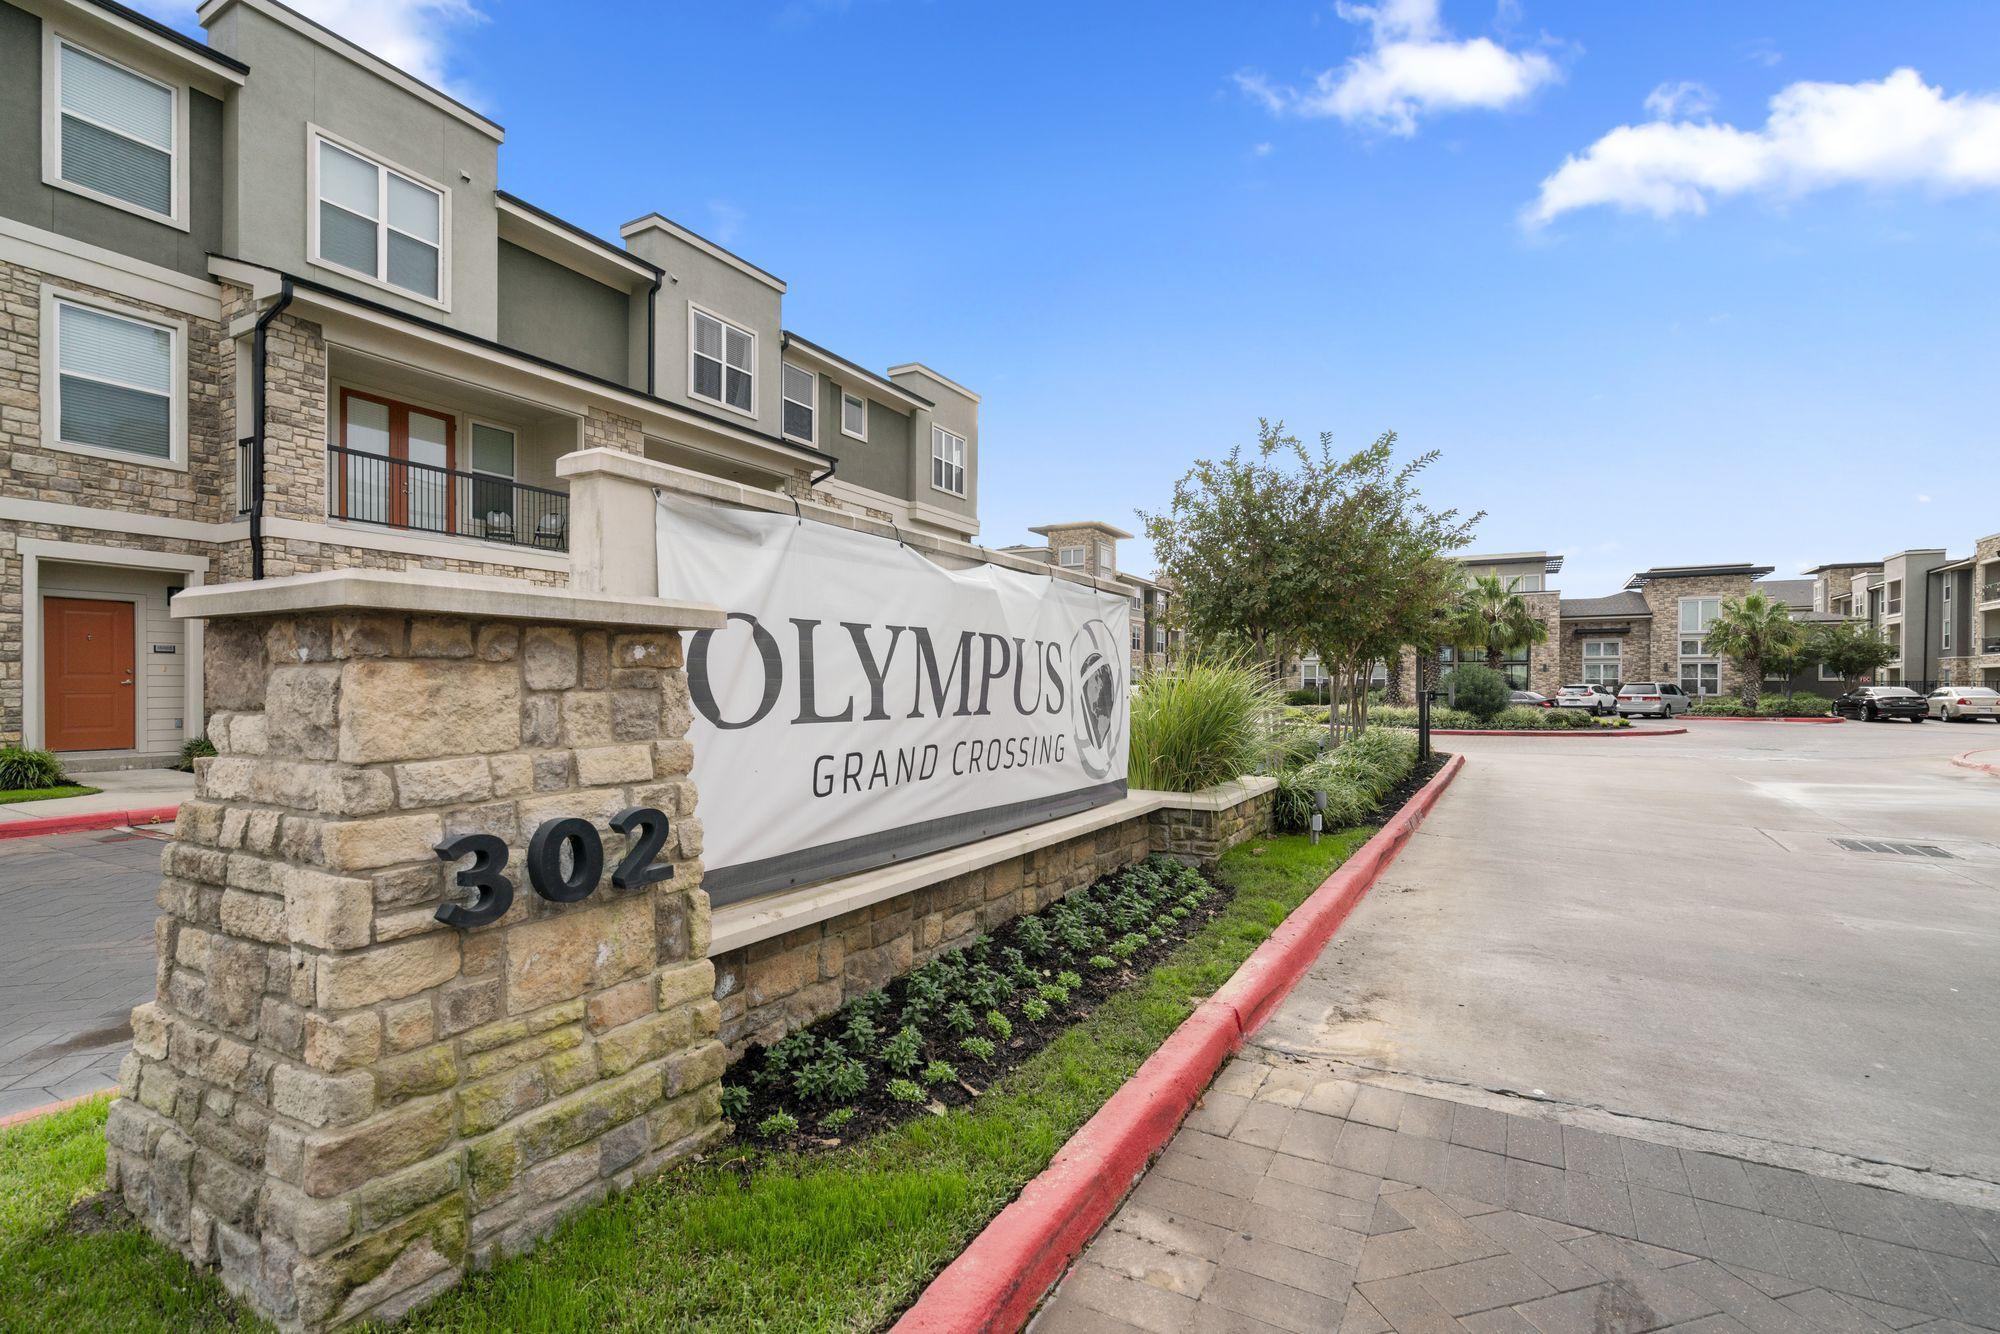 Olympus Grand Crossing